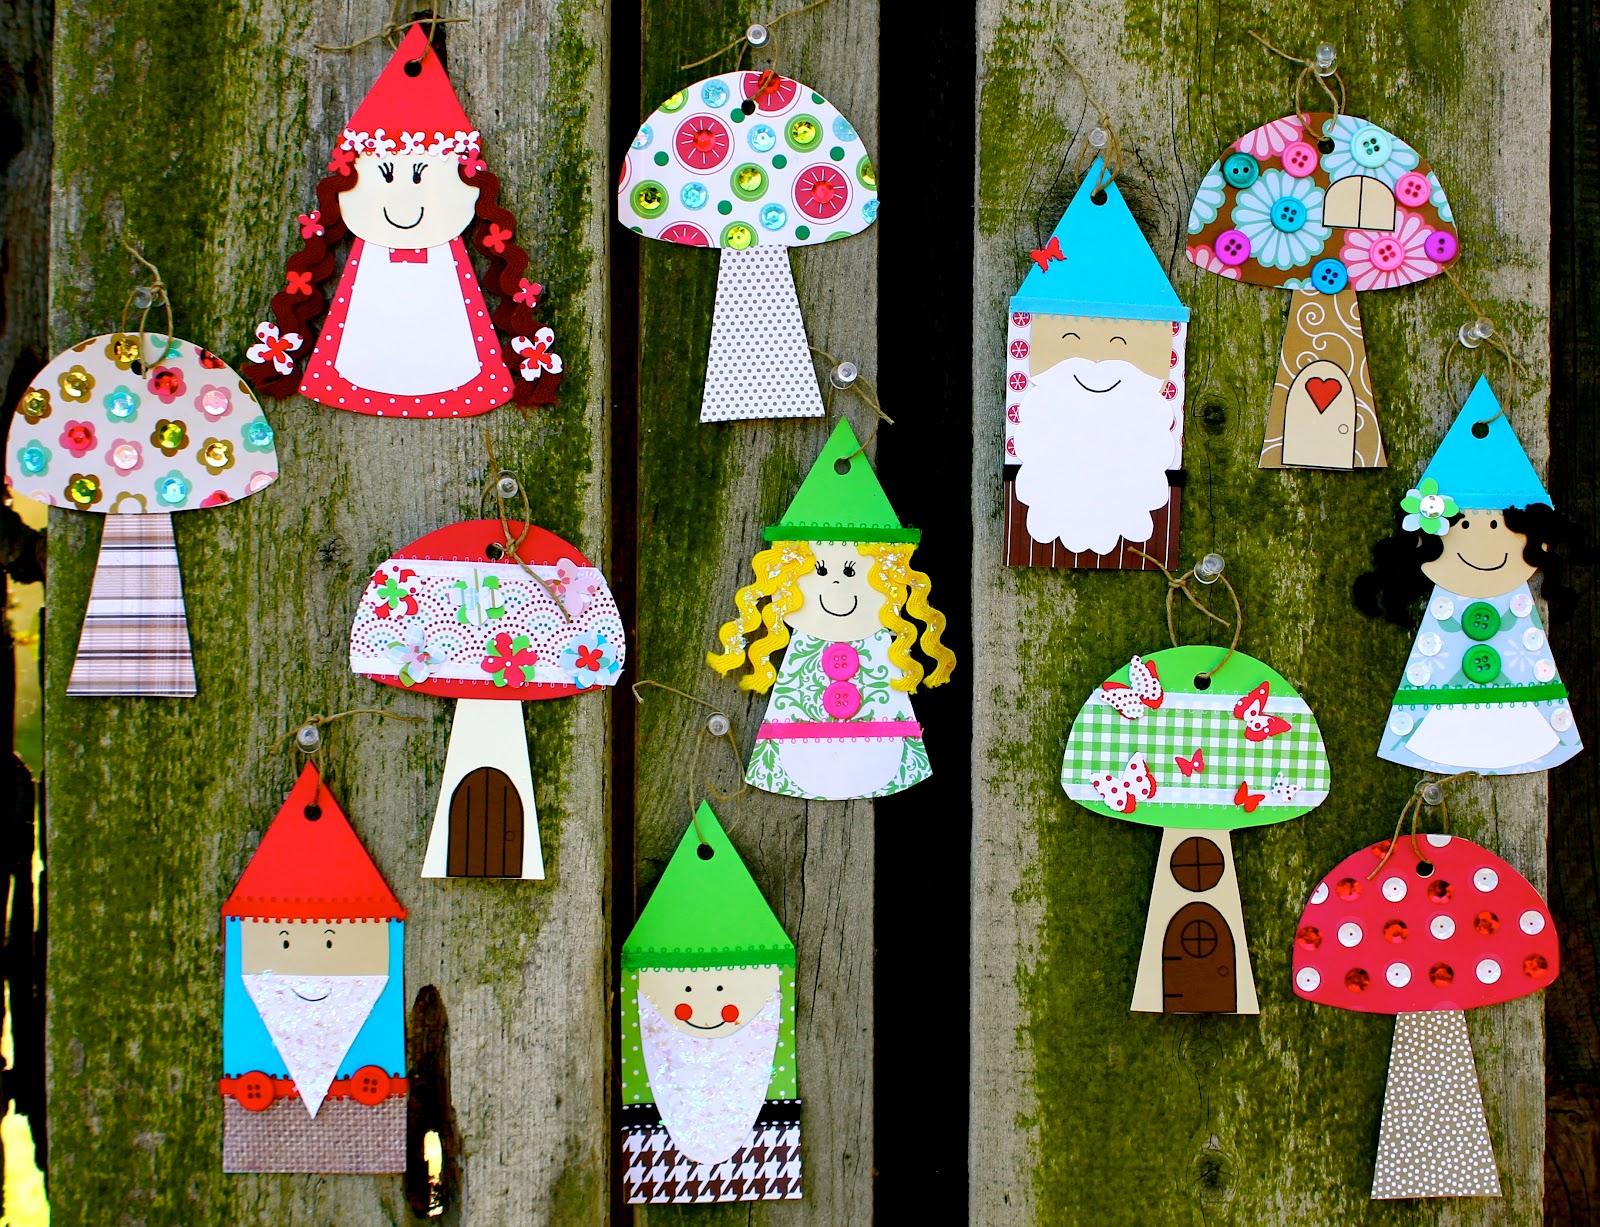 Smart bottom enterprises gnome and mushroom banner craft kit for Craft kits for preschoolers